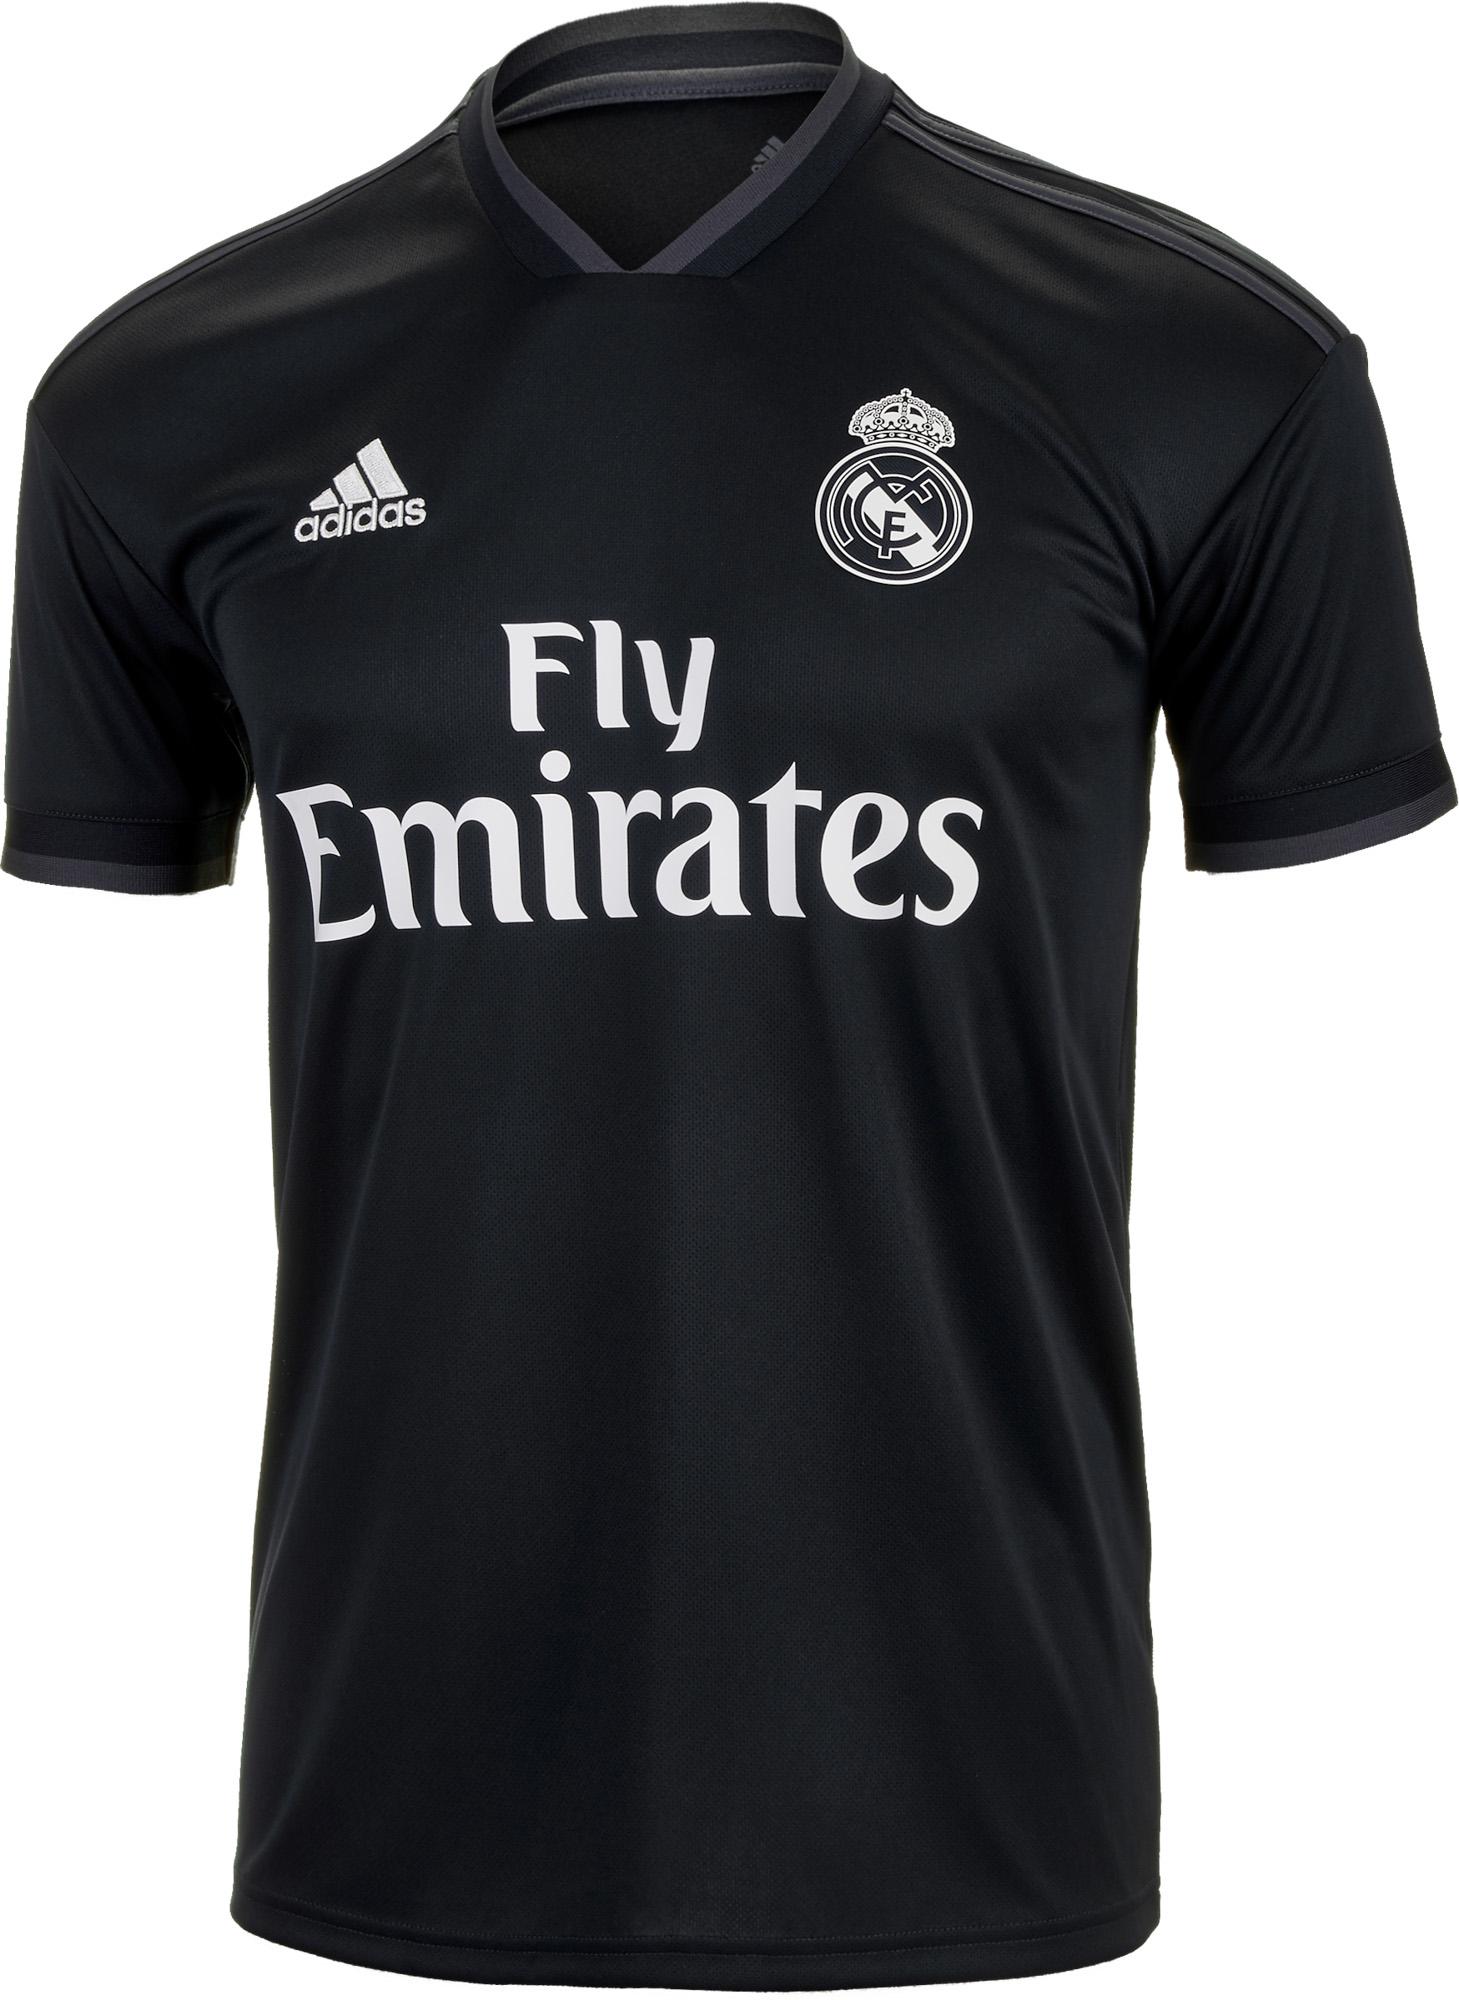 7ded2b6080e adidas Sergio Ramos Real Madrid Away Jersey - Youth 2018-19 - SoccerPro